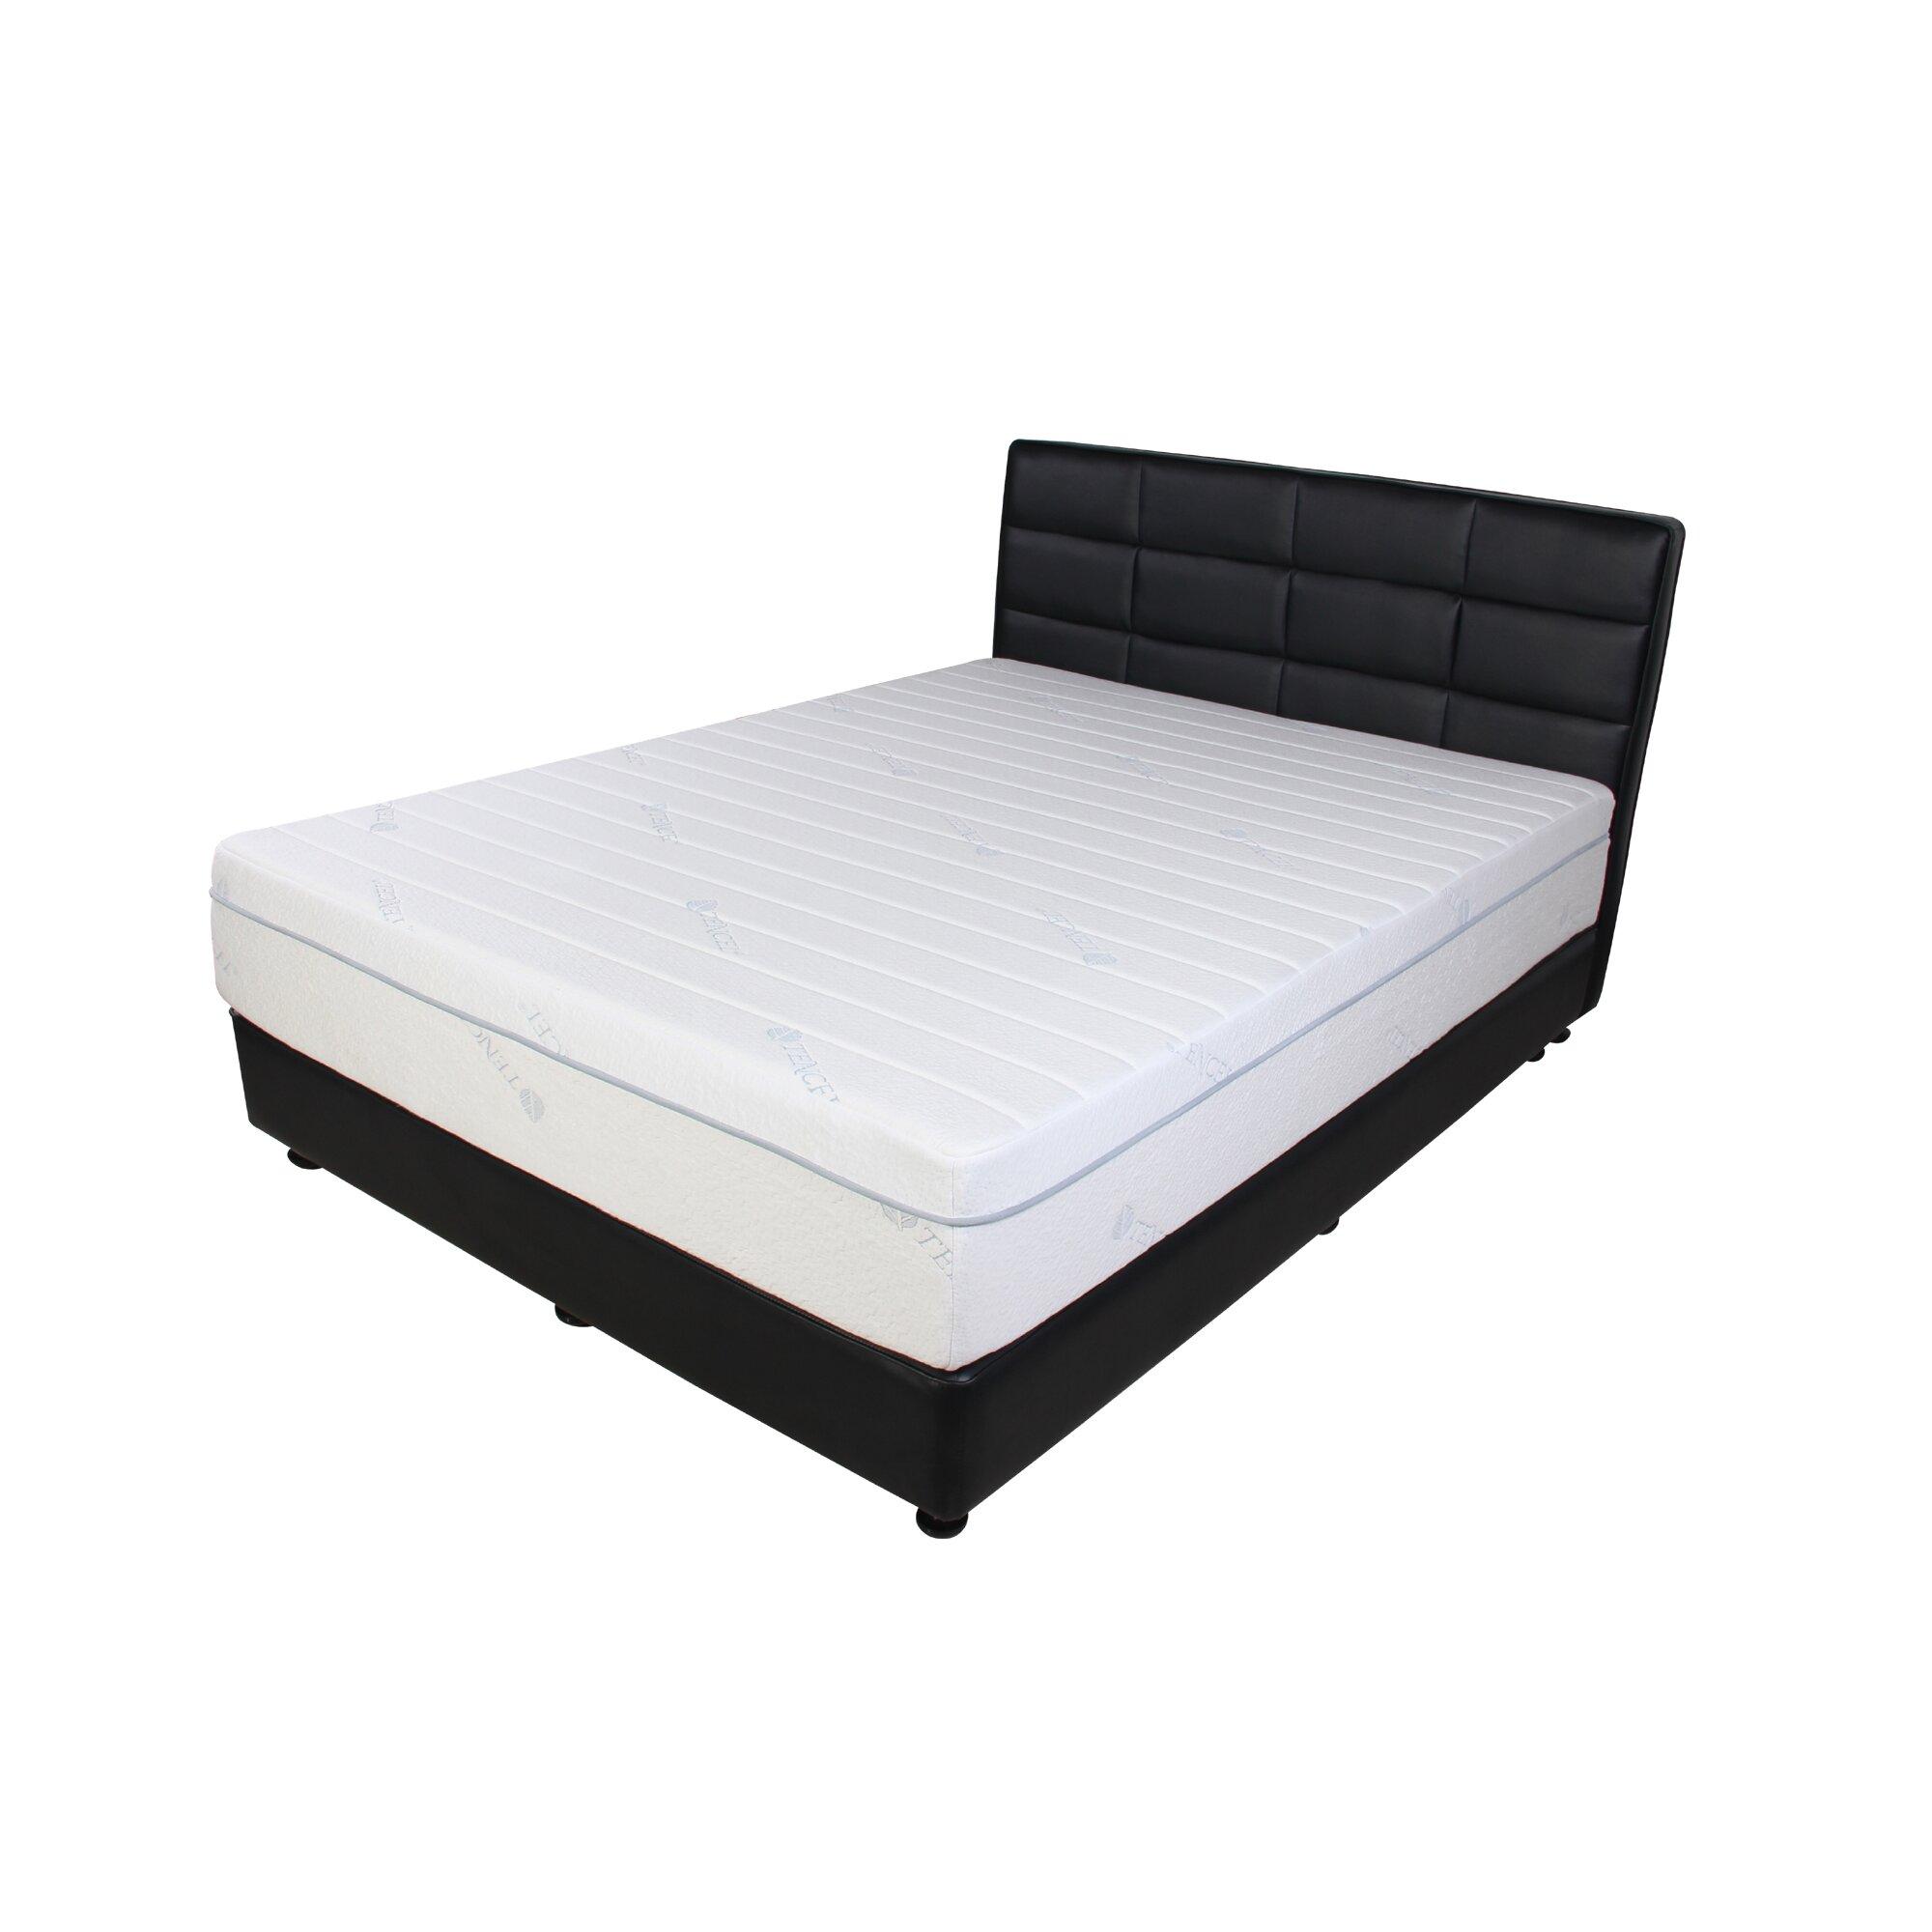 "Designed to Sleep 11"" Gel Memory Foam Mattress & Reviews"